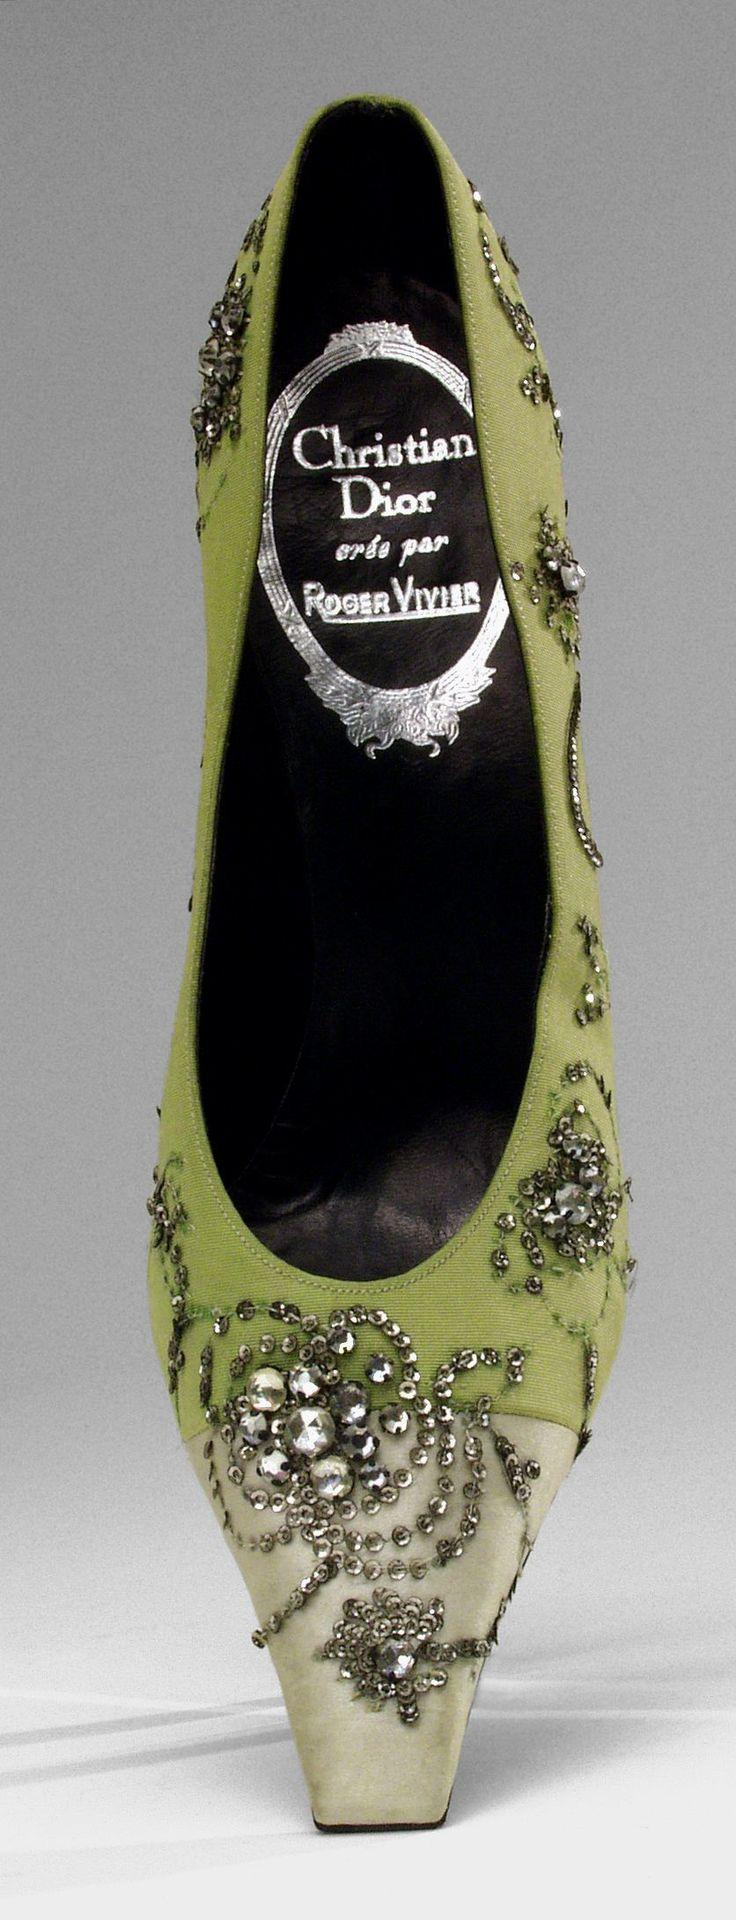 Roger Vivier for Christian Dior, Evening Shoes, 1957